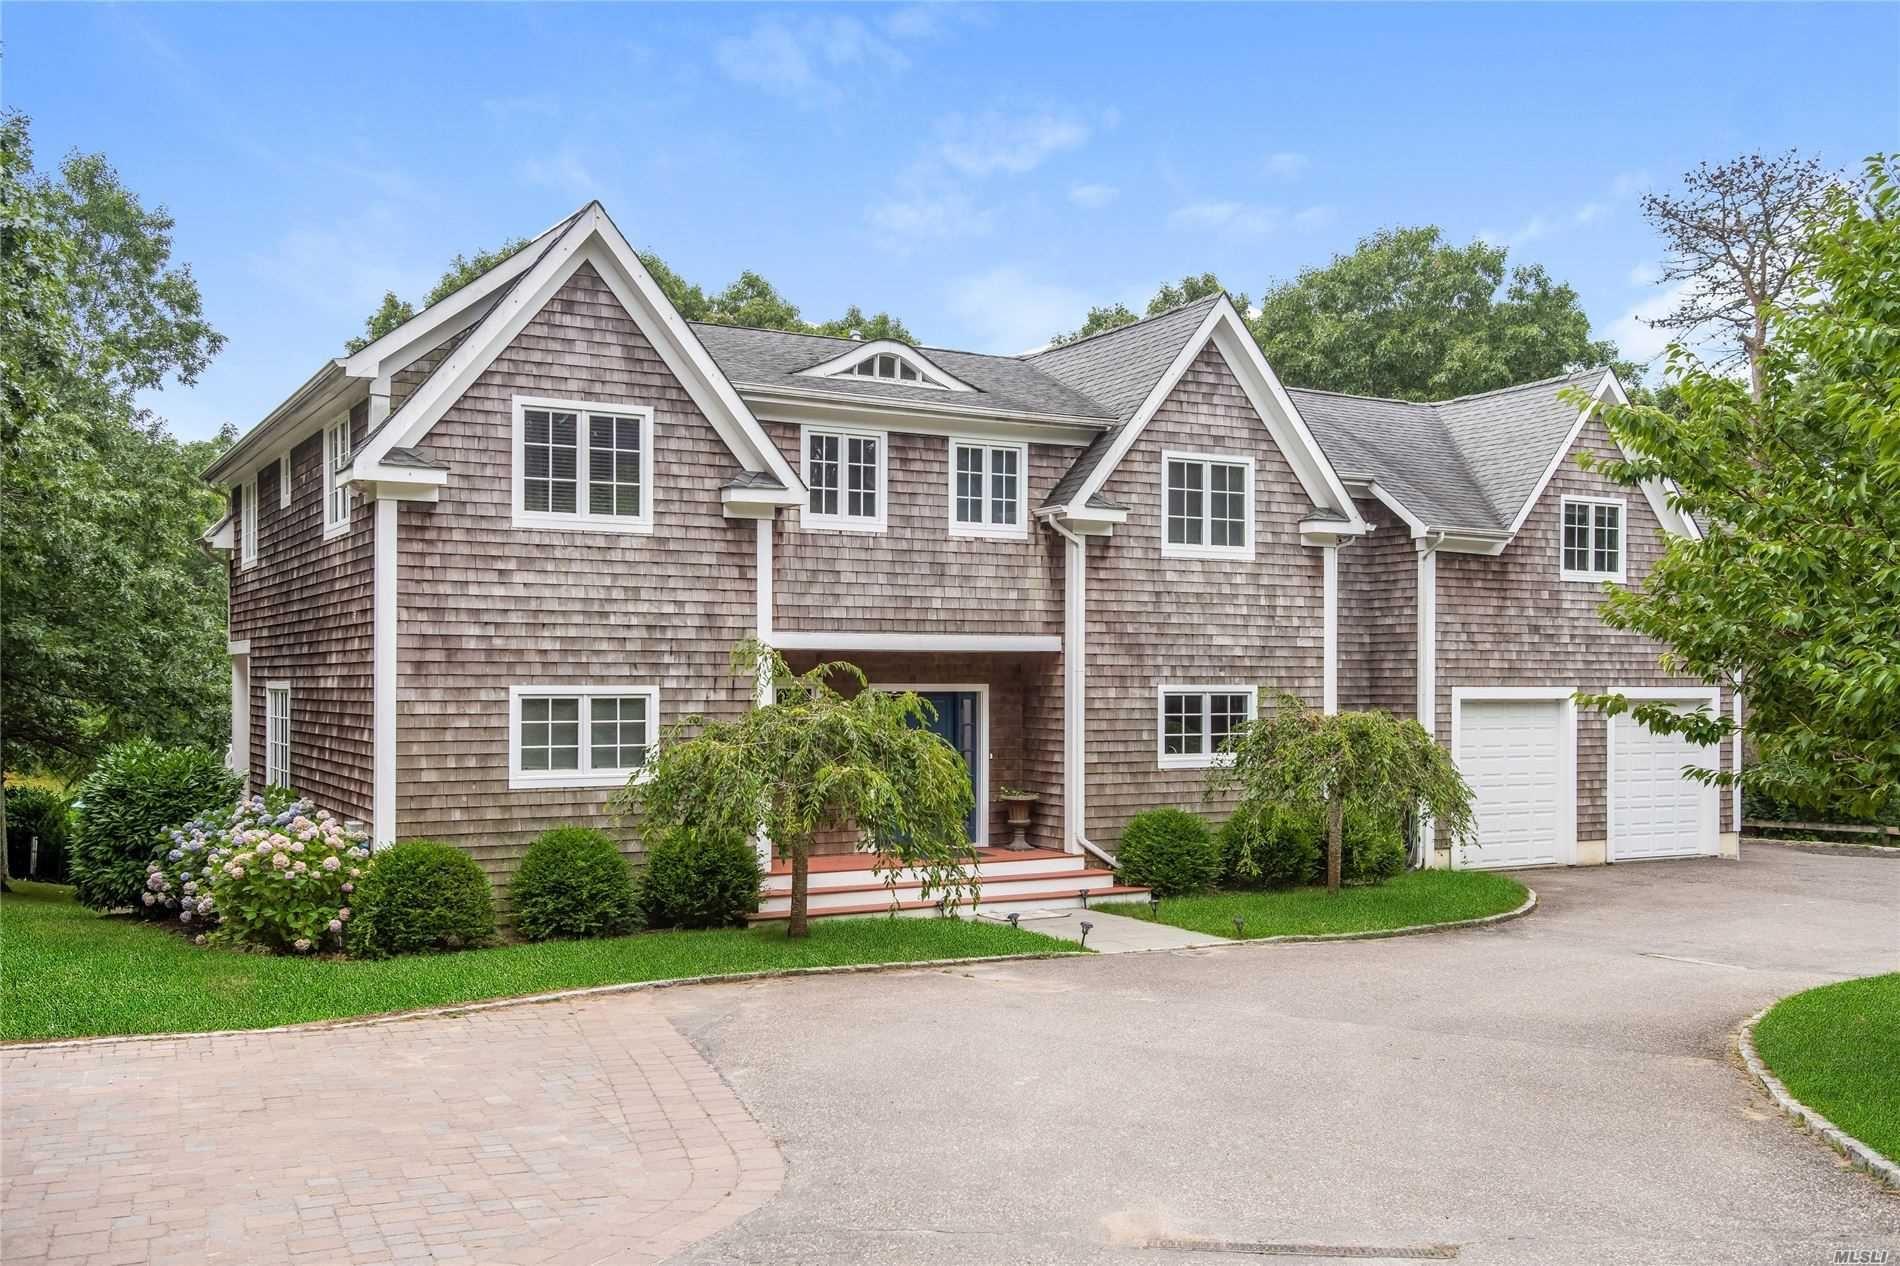 45B E Old Riverhead Road, Hampton Bays, NY 11946 - MLS#: 3235533